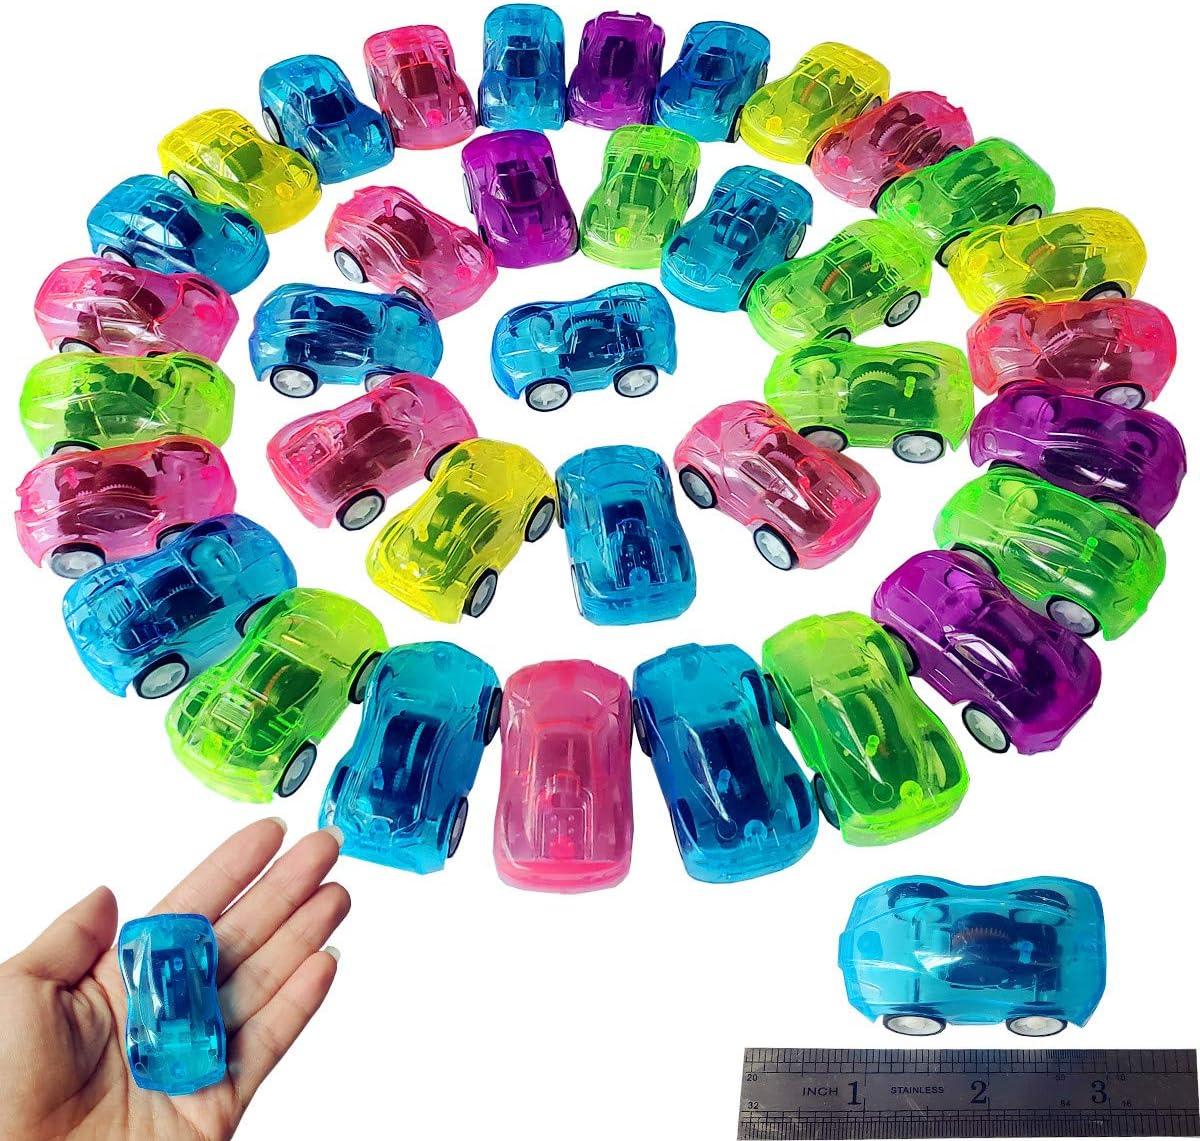 online shop 36 Pcs Upgrade Pull Back Vehicles Toys Car Powered Friction Overseas parallel import regular item Mini